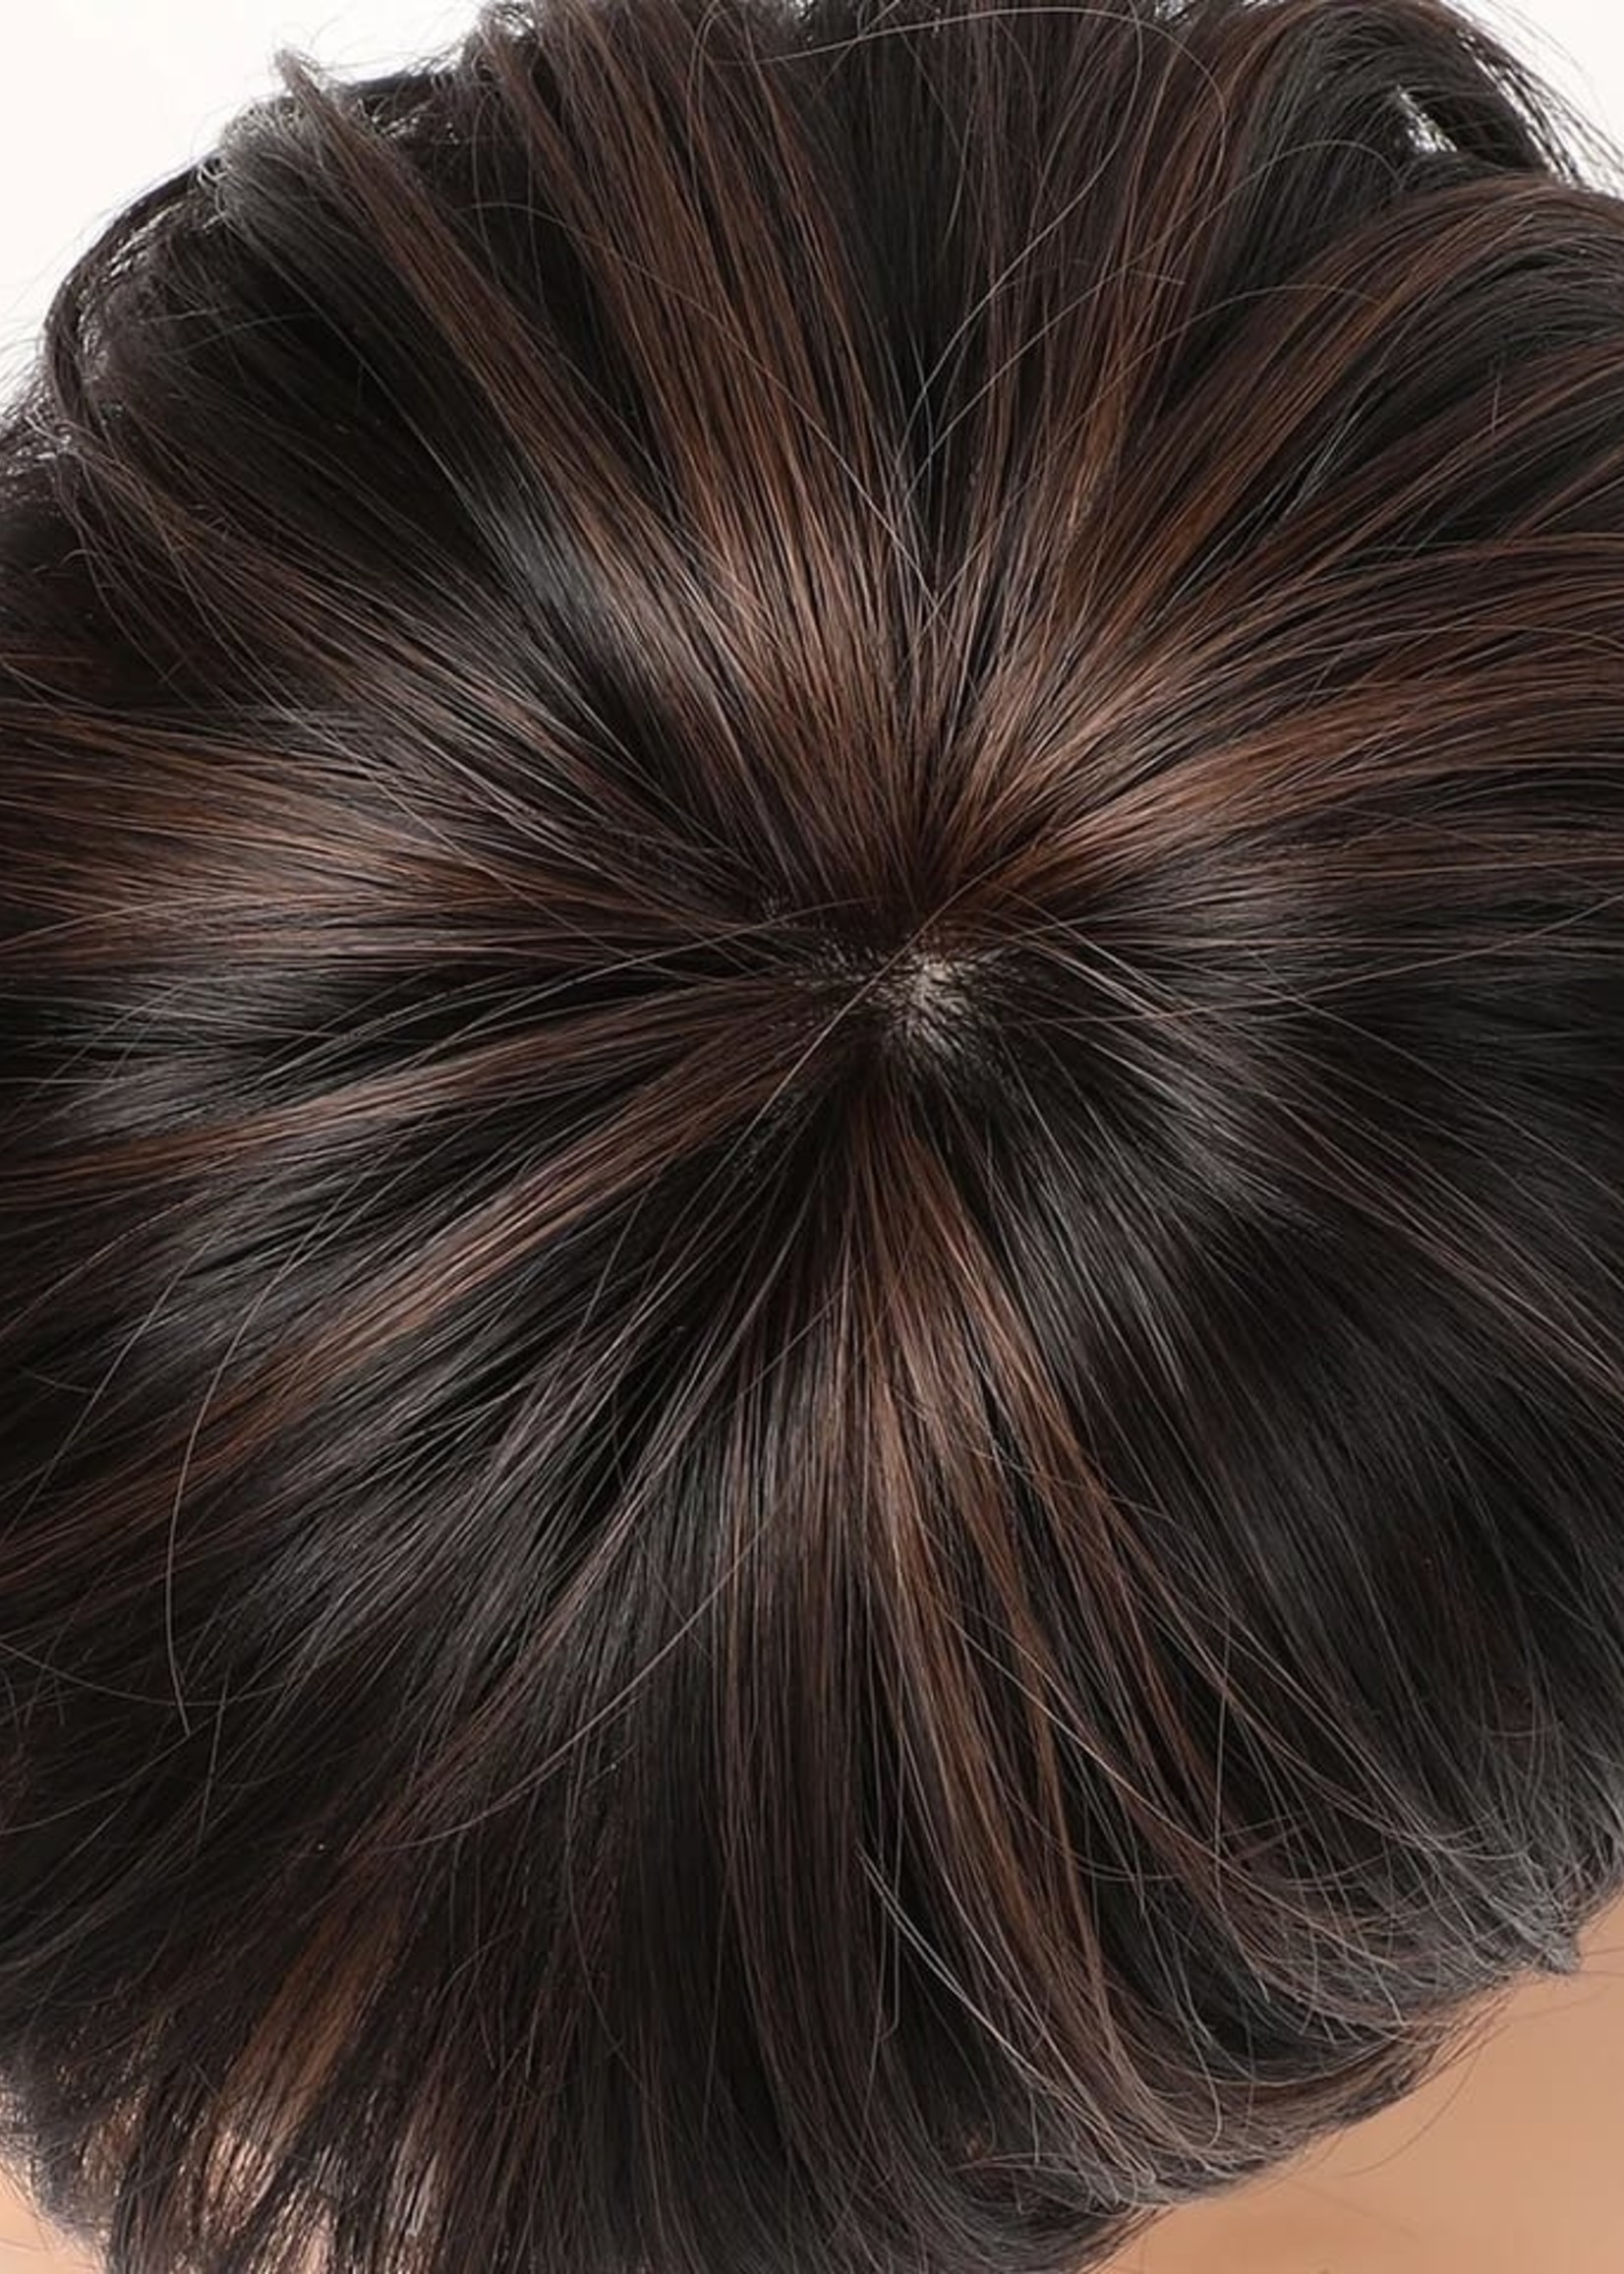 Synthetic Wig - Nia